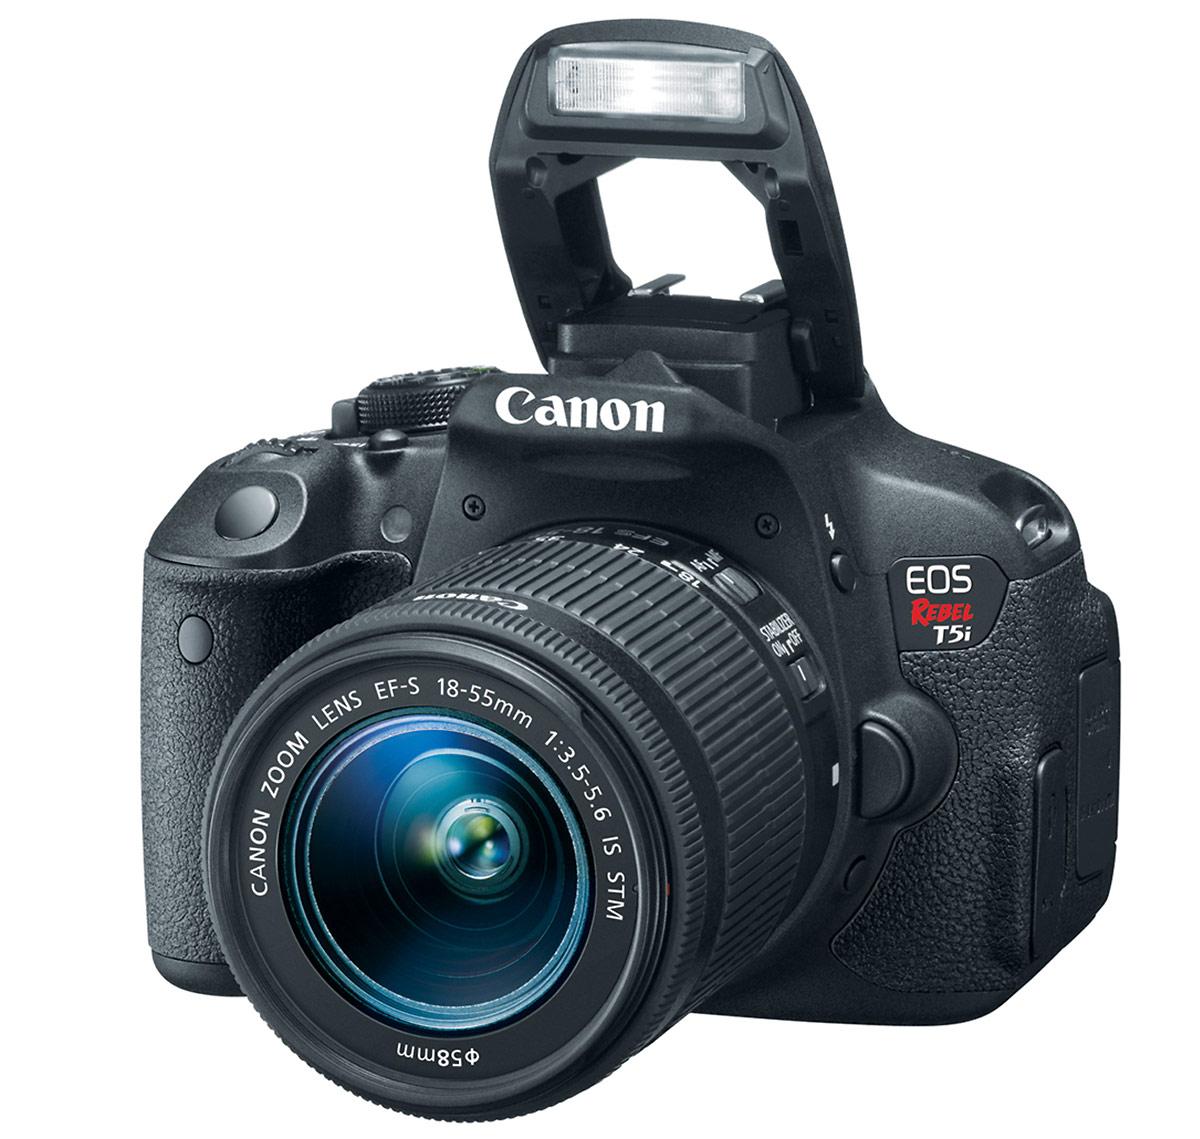 Canon EOS Rebel T5i DSLR - Pop-Up Flash